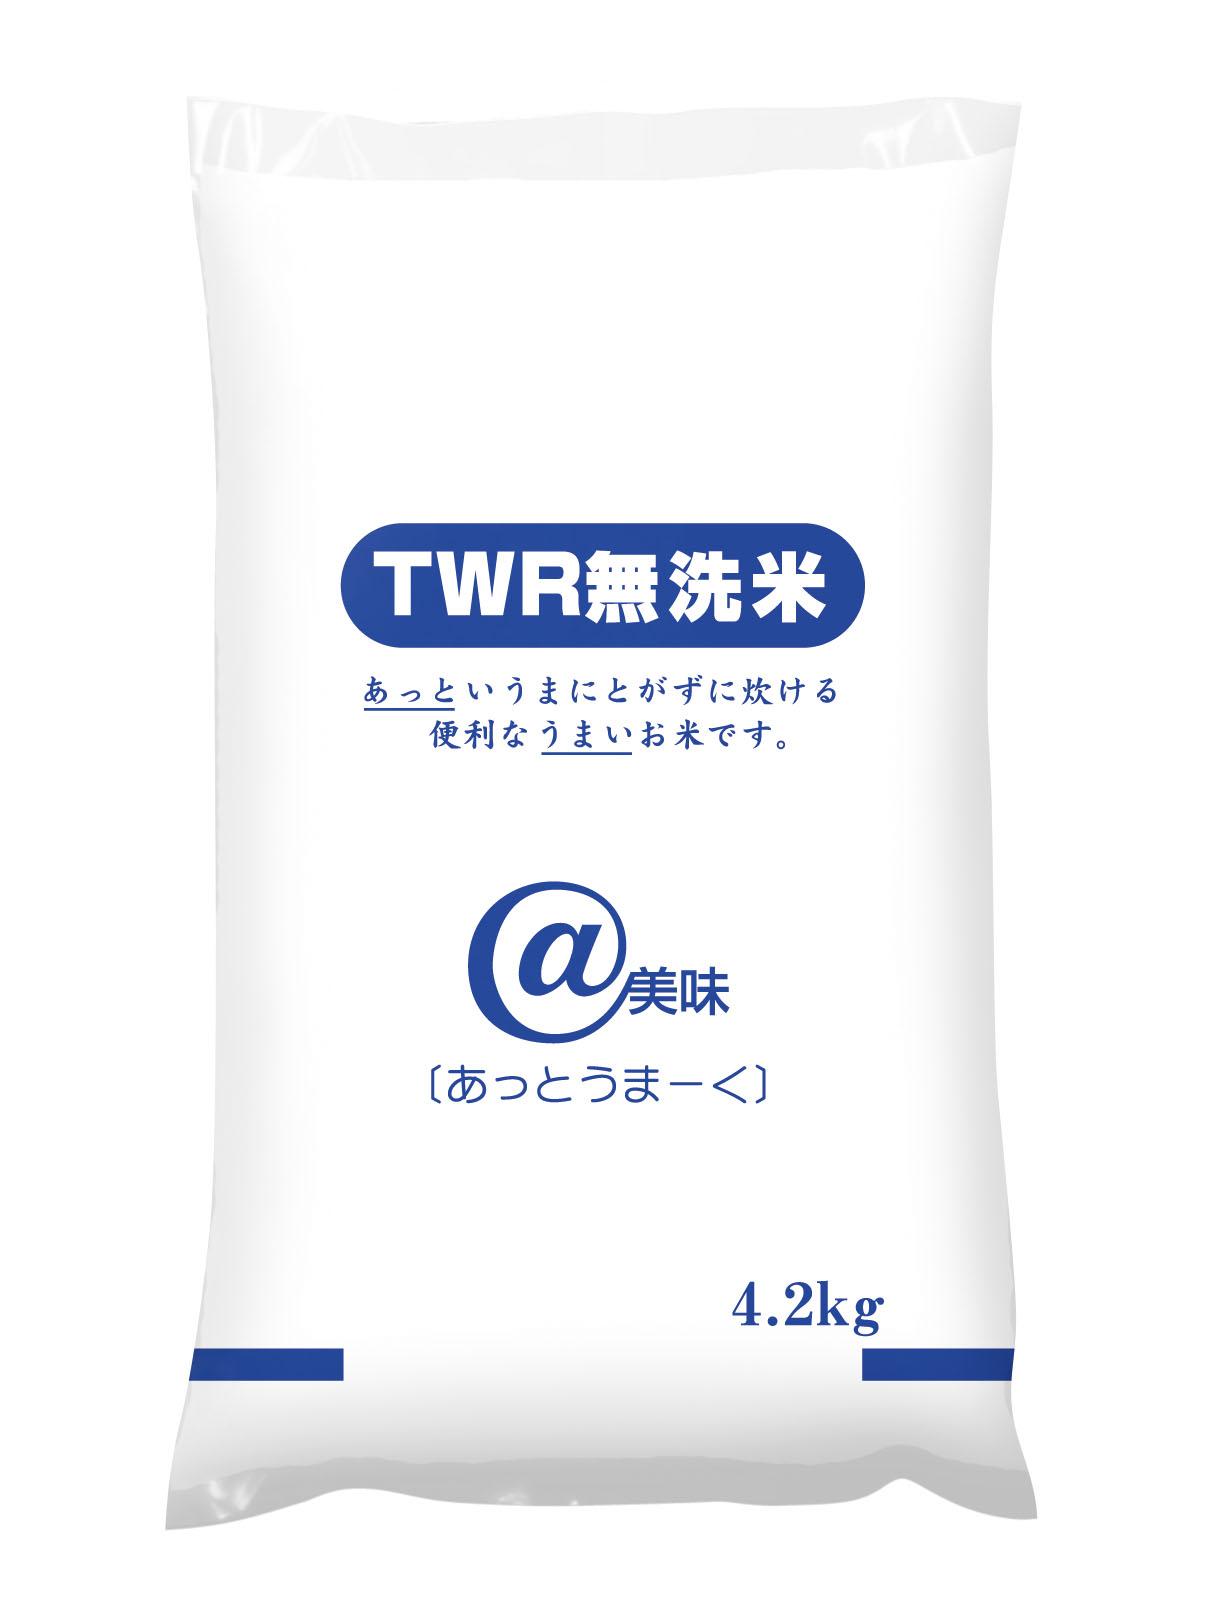 TWR無洗米 4.2kg